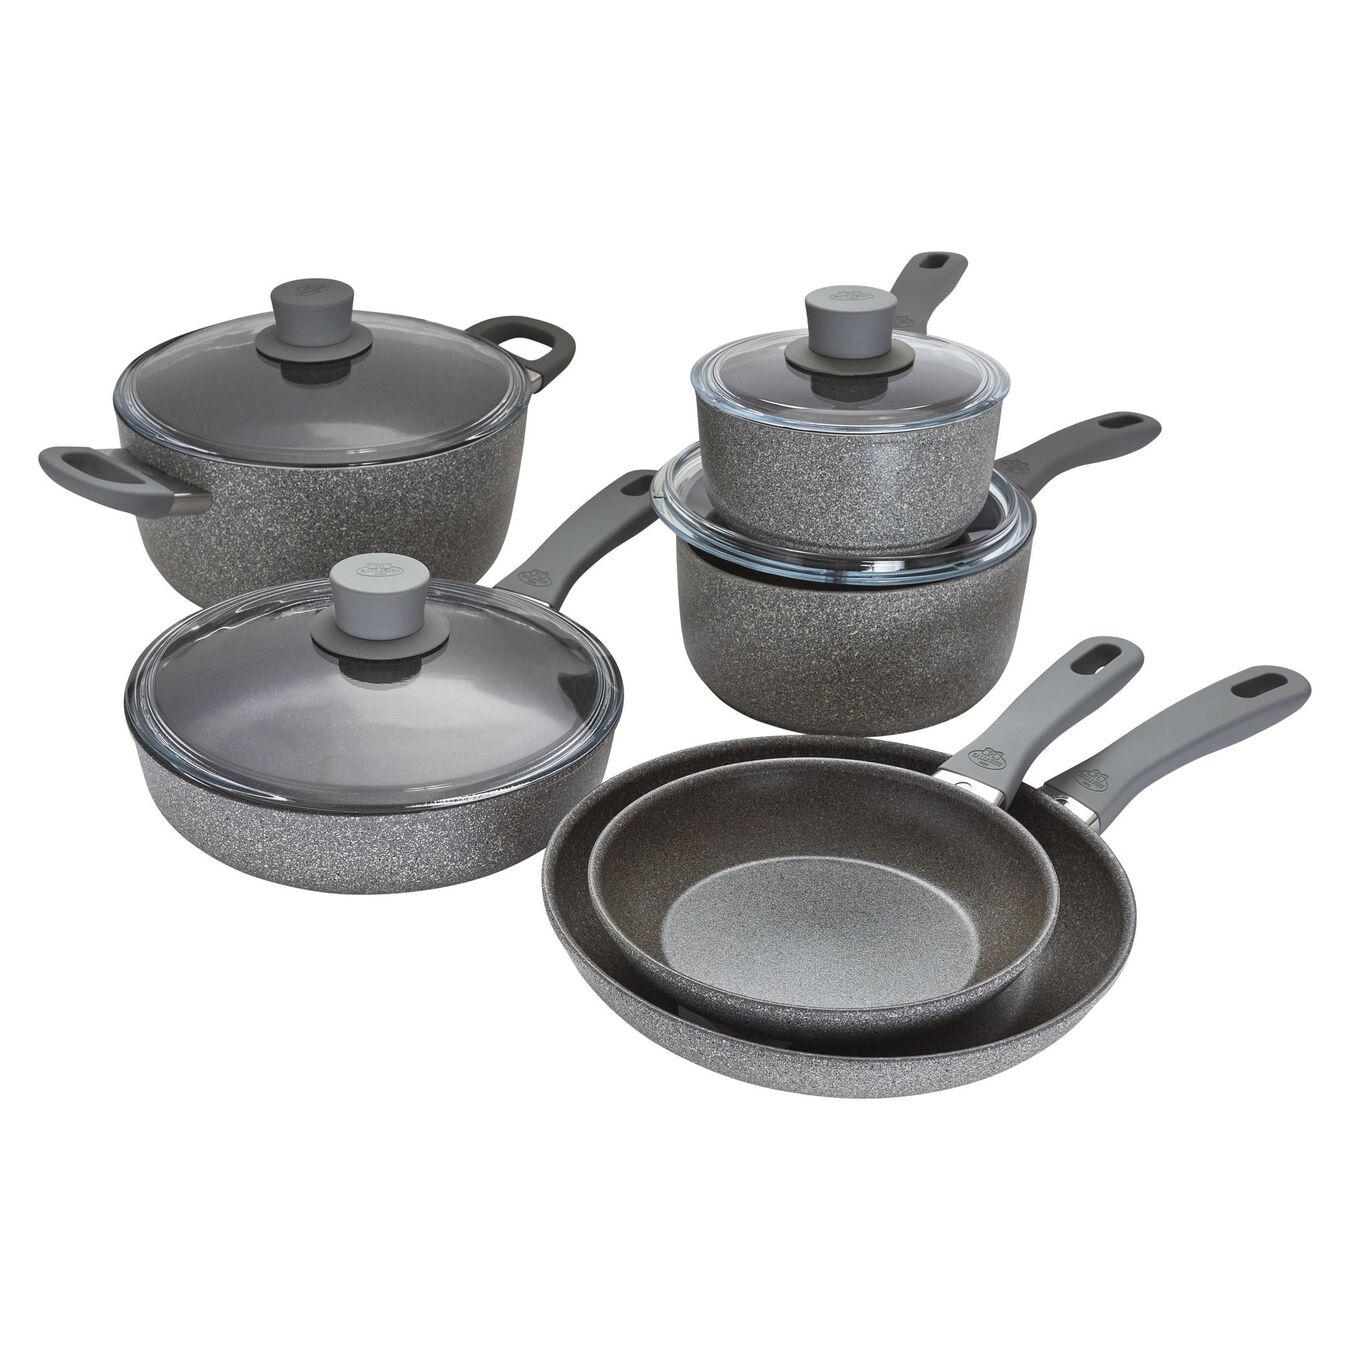 10-pc, Aluminum Nonstick Cookware Set,,large 1